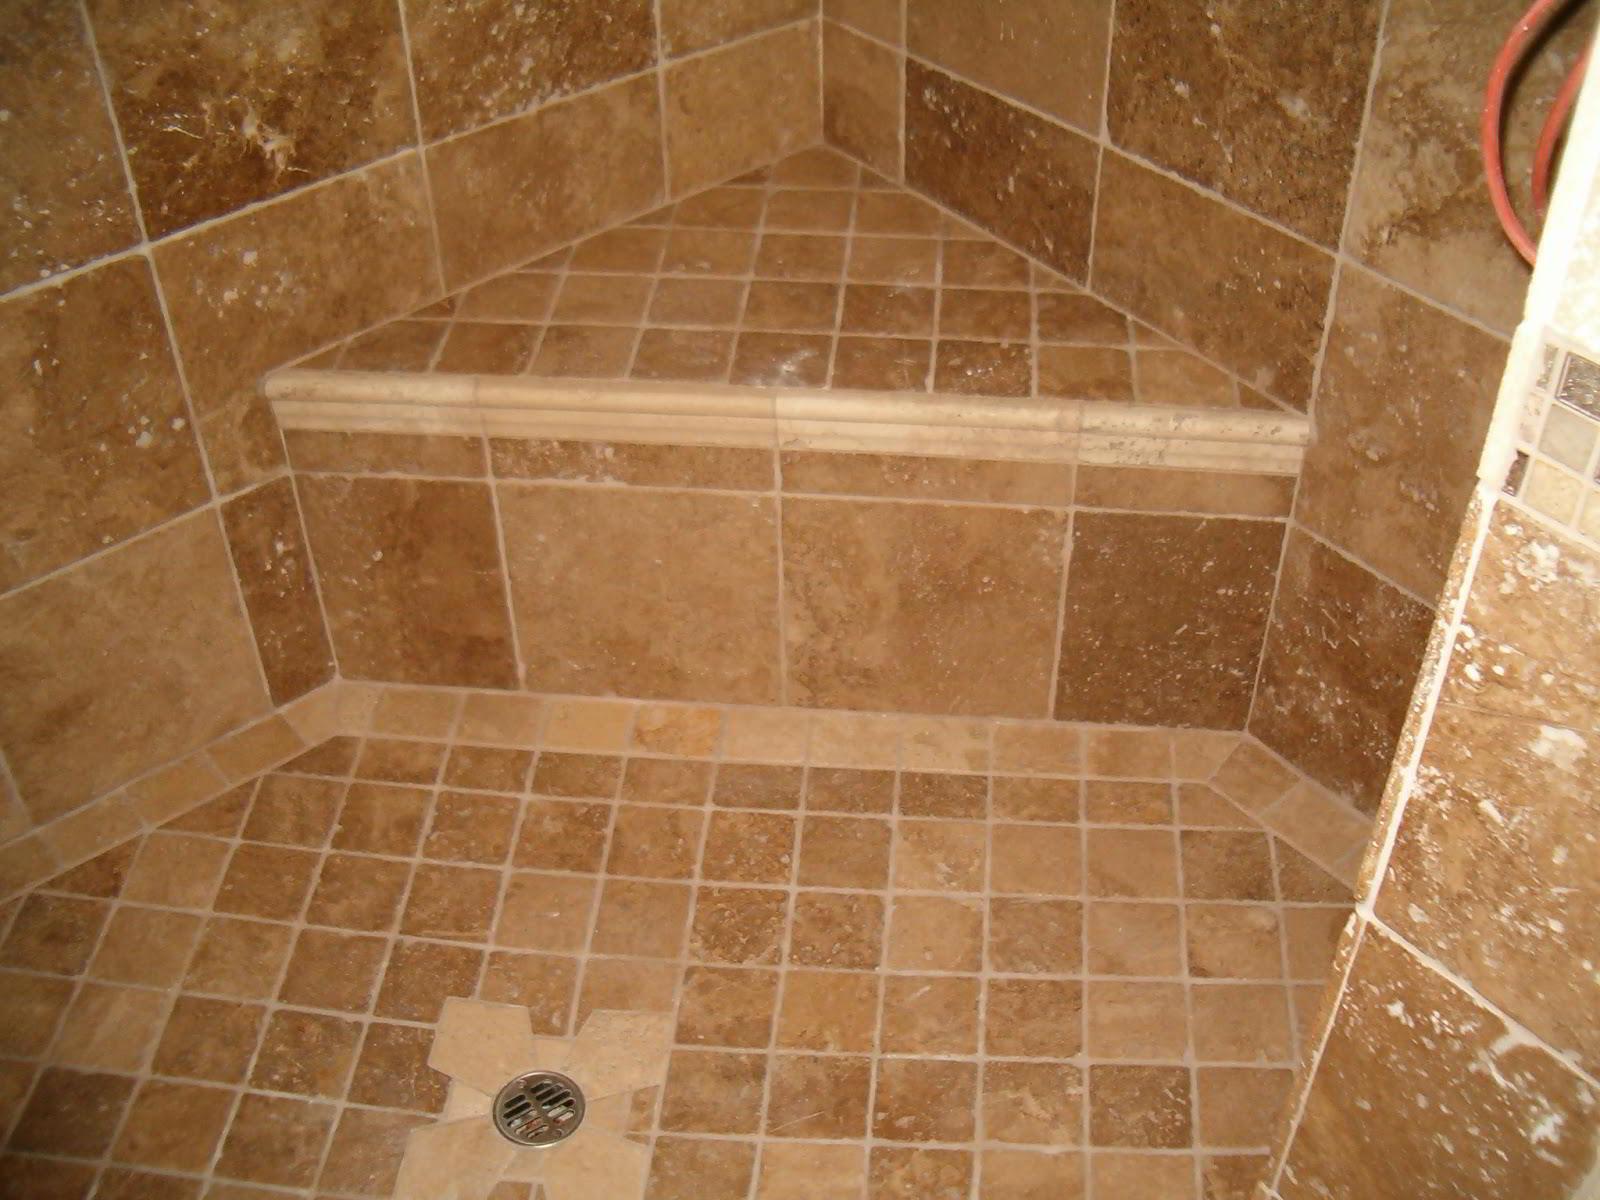 Keramik Lantai Kamar Mandi Minimalis | 32 model & harga keramik lantai dapur, ruang tamu, teras + kamar mandi | Tips Cara Memilih Lantai Keramik Minimalis Harga Terbaik